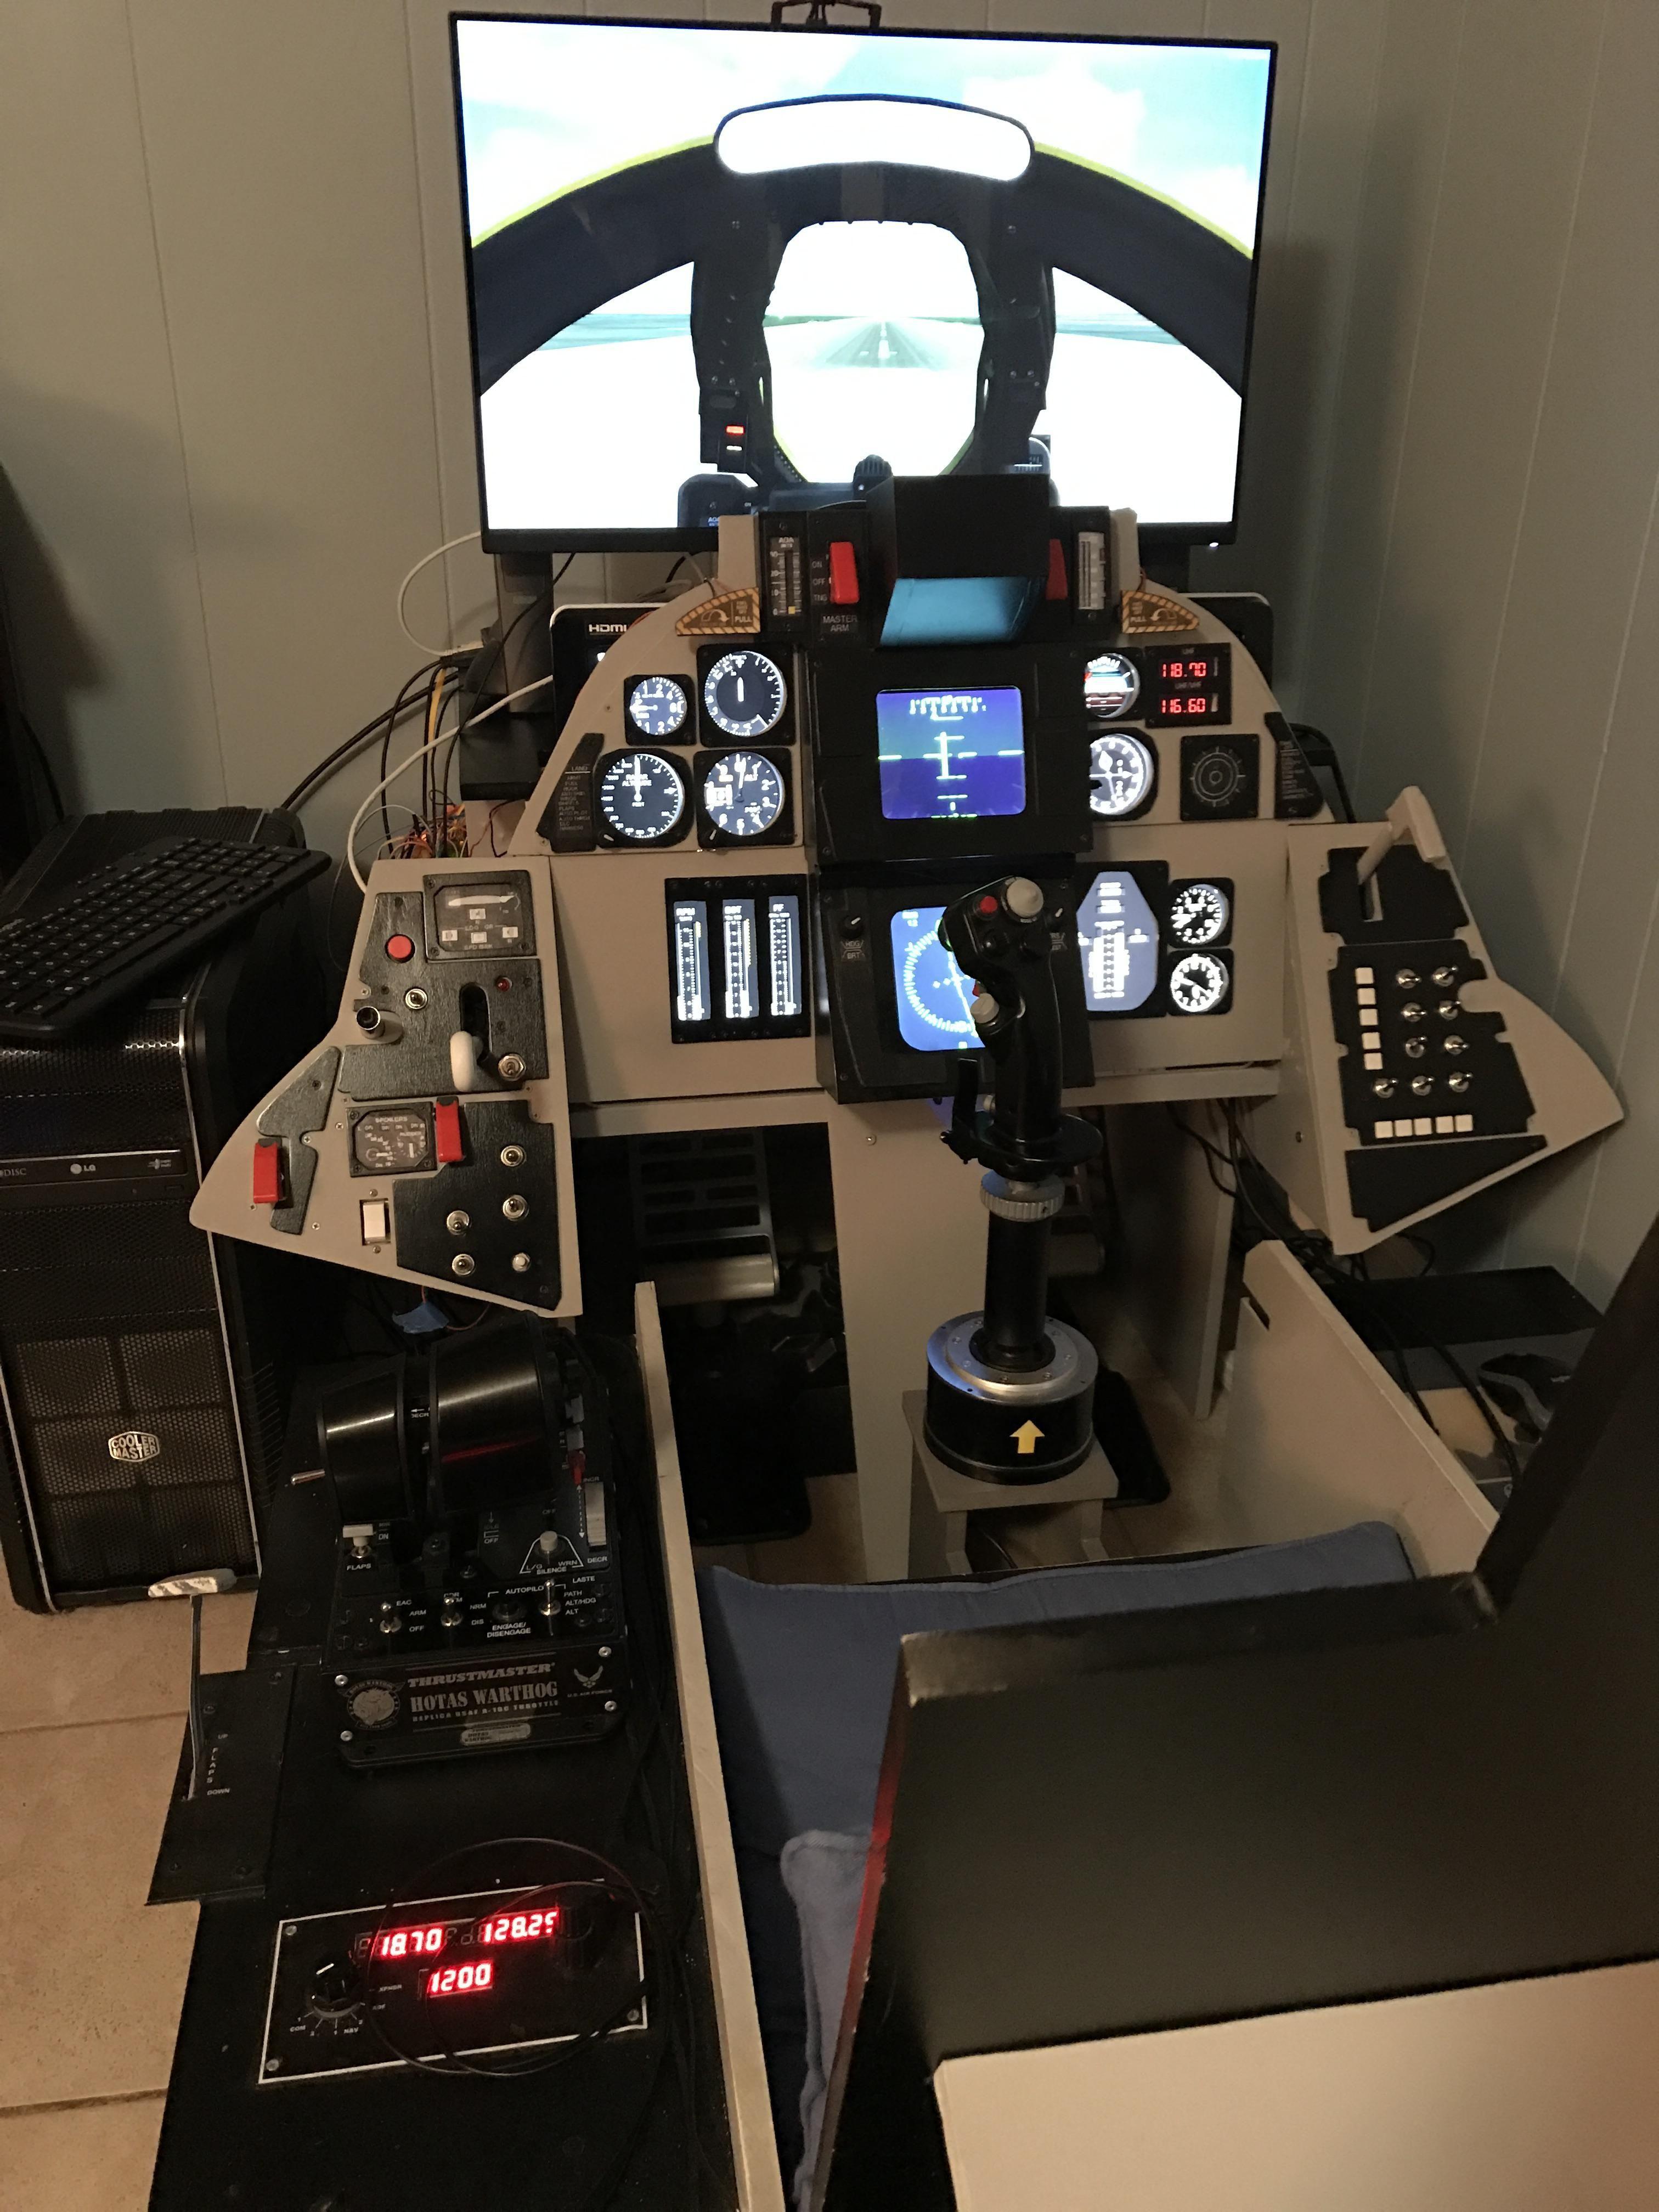 Best Flight Simulators For PC 2018 Flight simulator